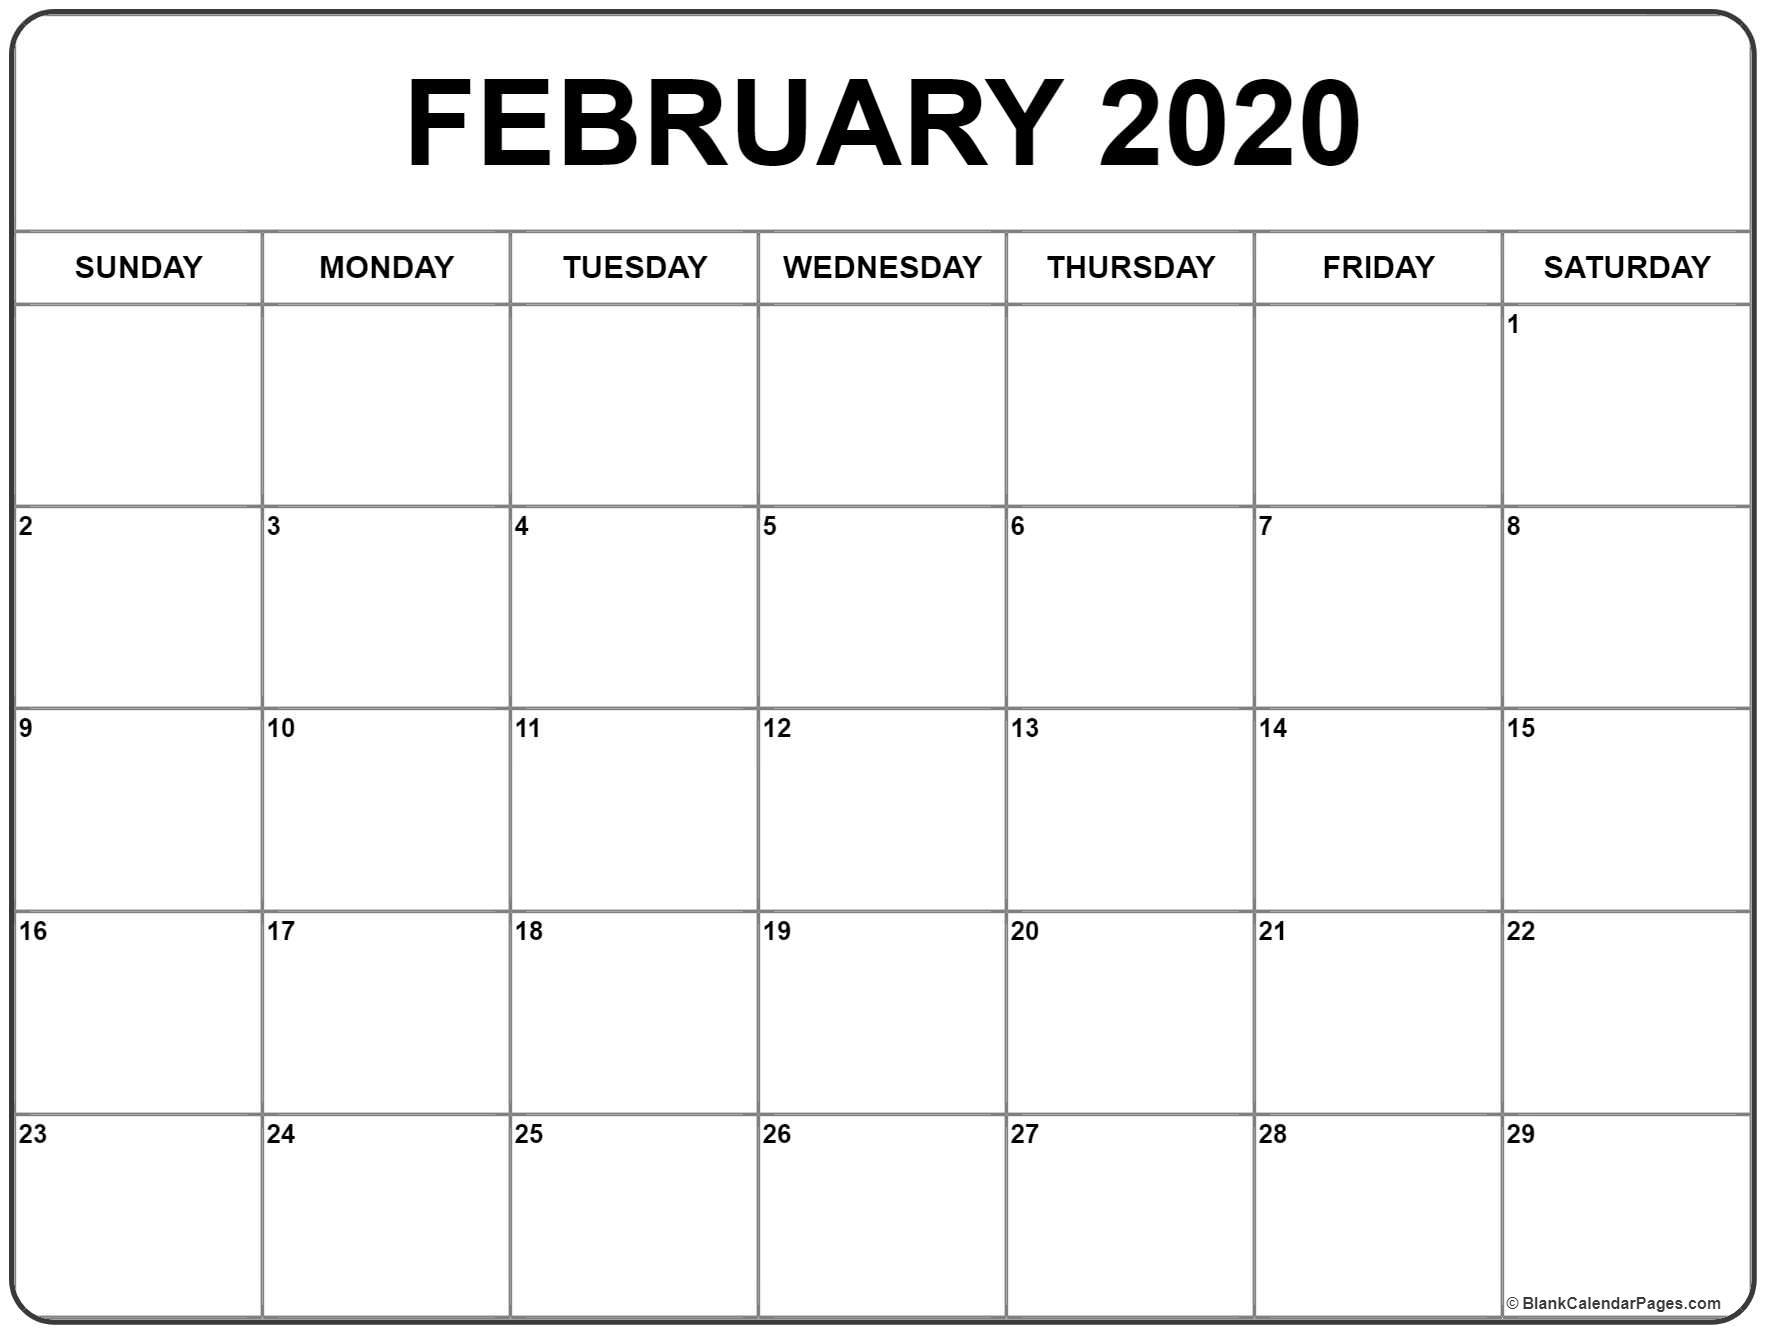 Free February 2020 Printable Calendar Free February 2020 Calendar Printable (Leap Year)   Blank